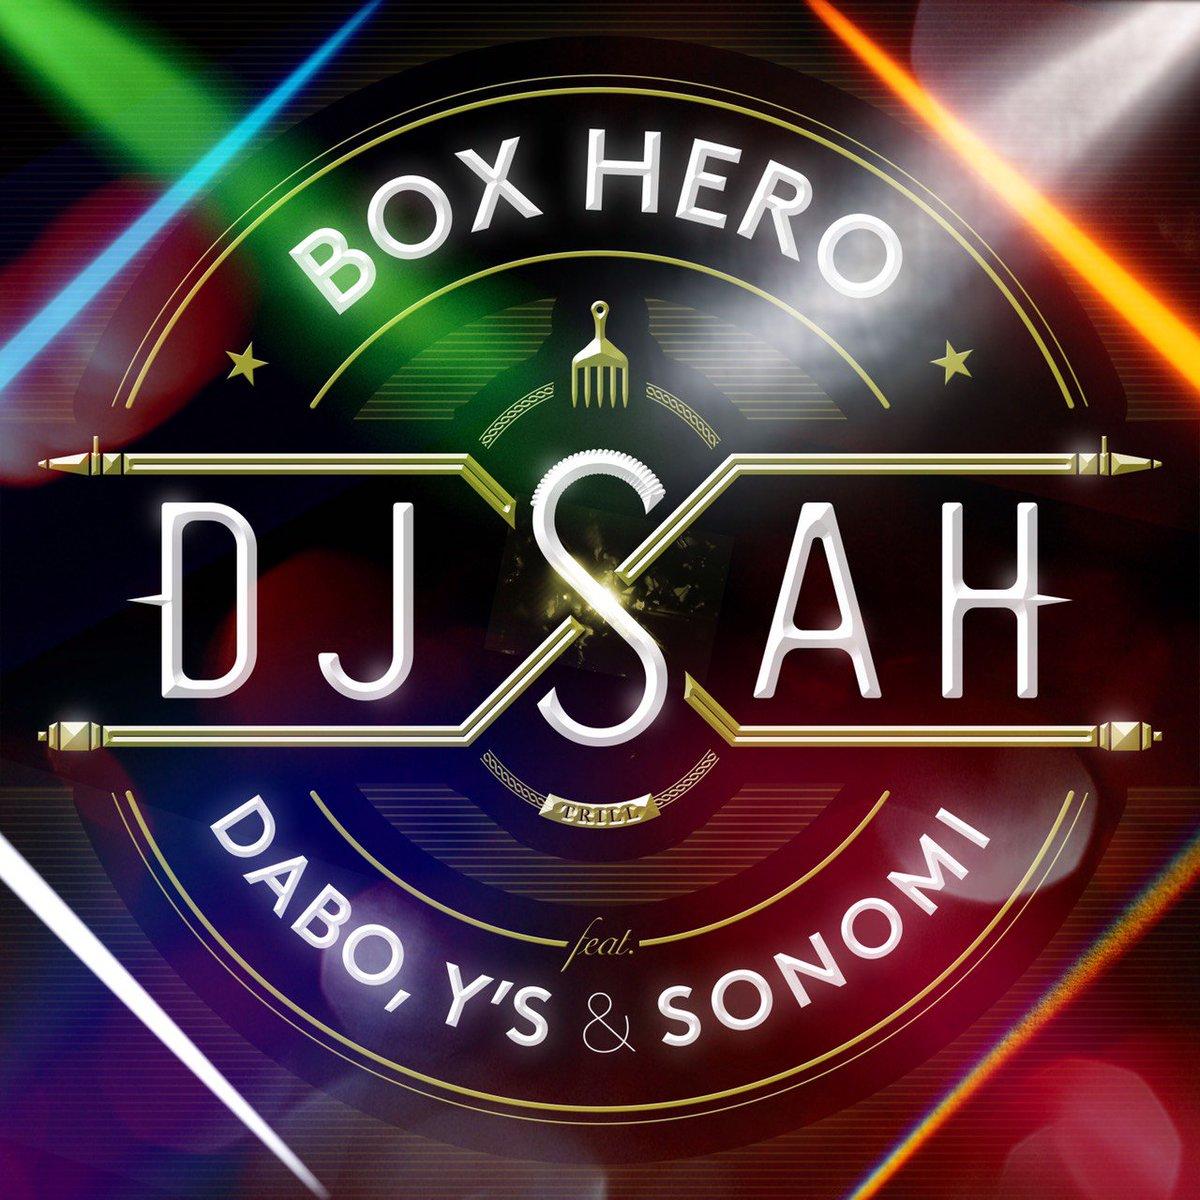 遂に配信開始&MV解禁   DJ SAH #BOXHERO  feat.DABO,Y'S & SONOMI  Produced by DJ WATARAI  MUSIC VIDEO→ https://t.co/CBJ4s95oBO https://t.co/wlyU8q2RhA